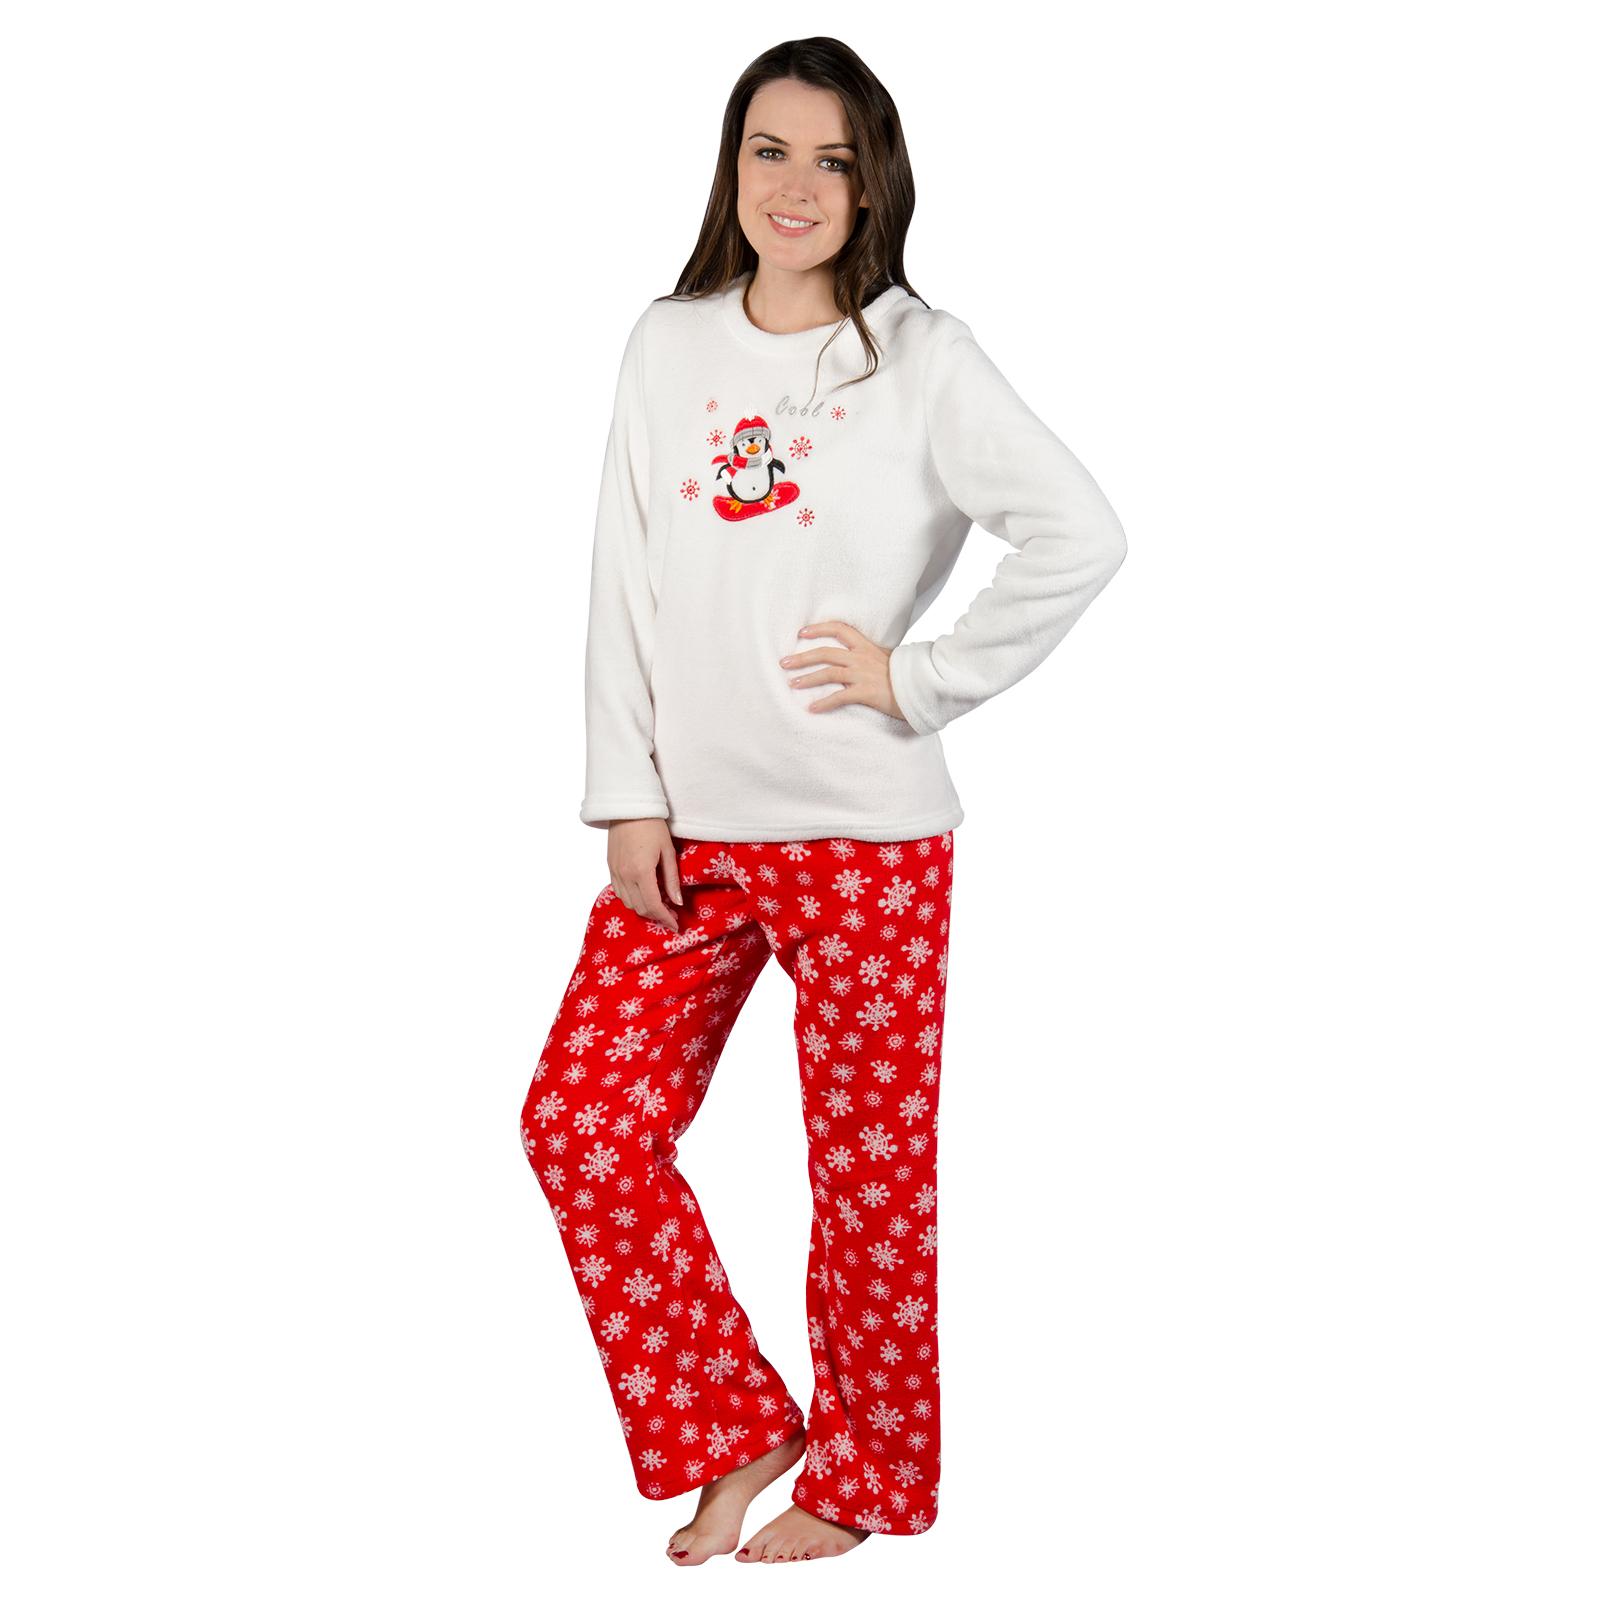 Ladies Chilly Penguin Fleece Pyjama Set PJs White Top ...